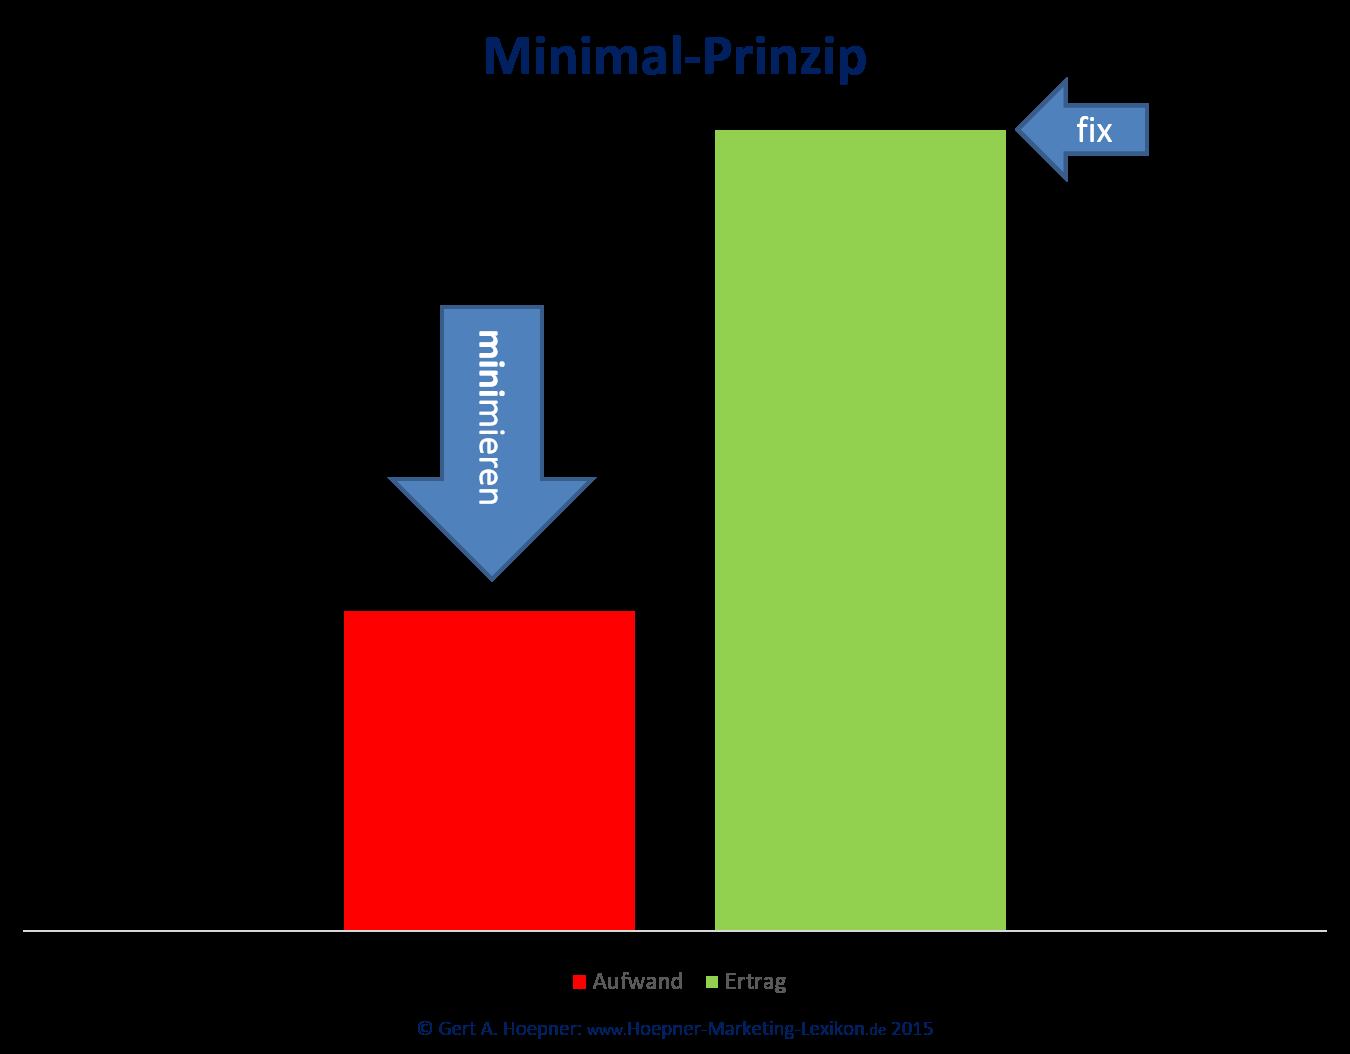 Minimal Und Maximal Prinzip